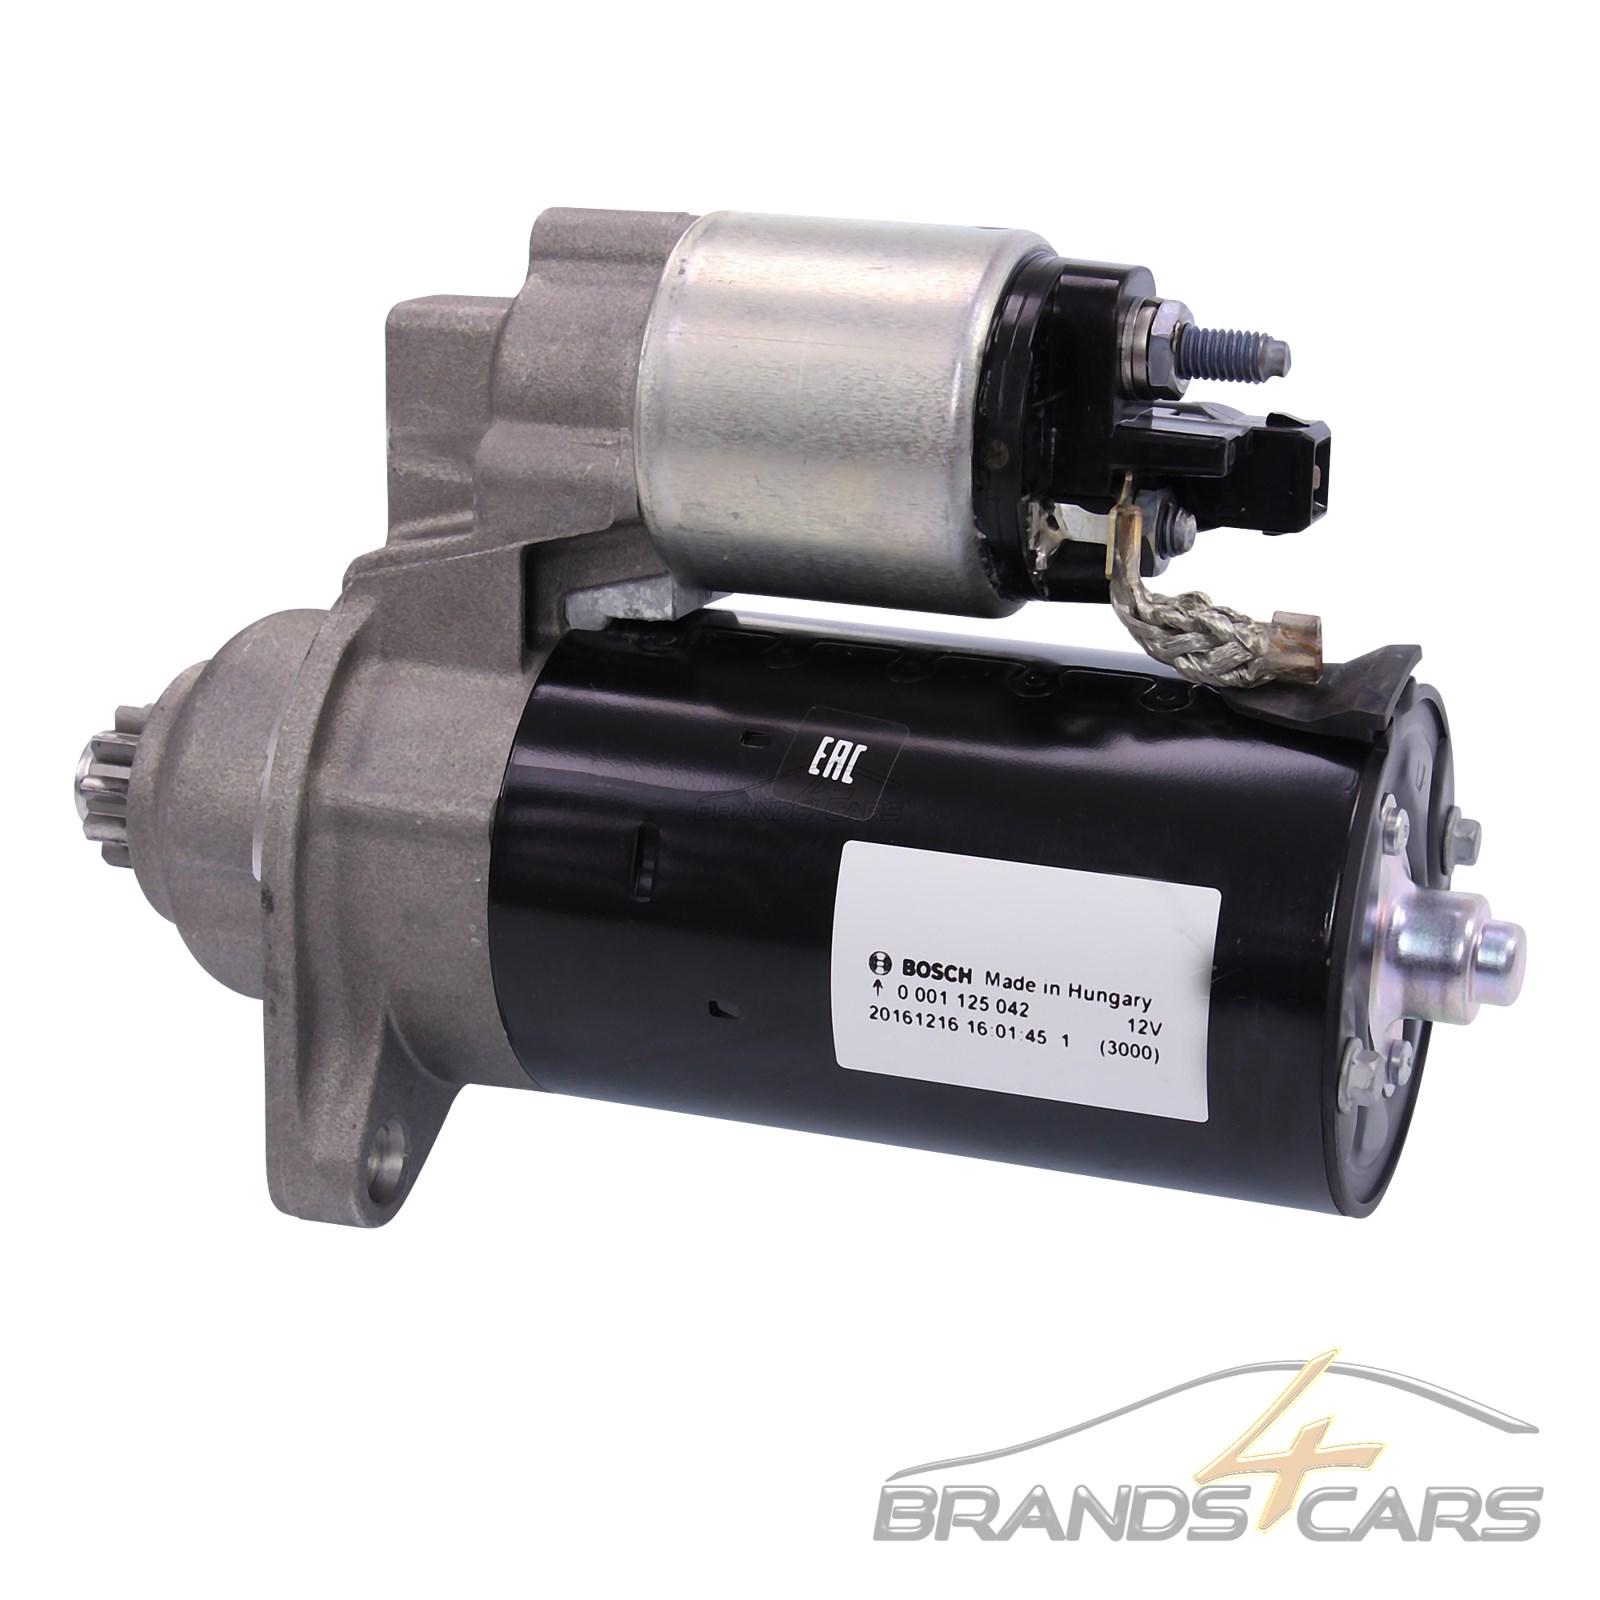 Bosch Starter Anlasser 2Kw Vw Bora Golf 4 1J 1.9 Tdi Caddy 2 1.9 Tdi Bj 96-03